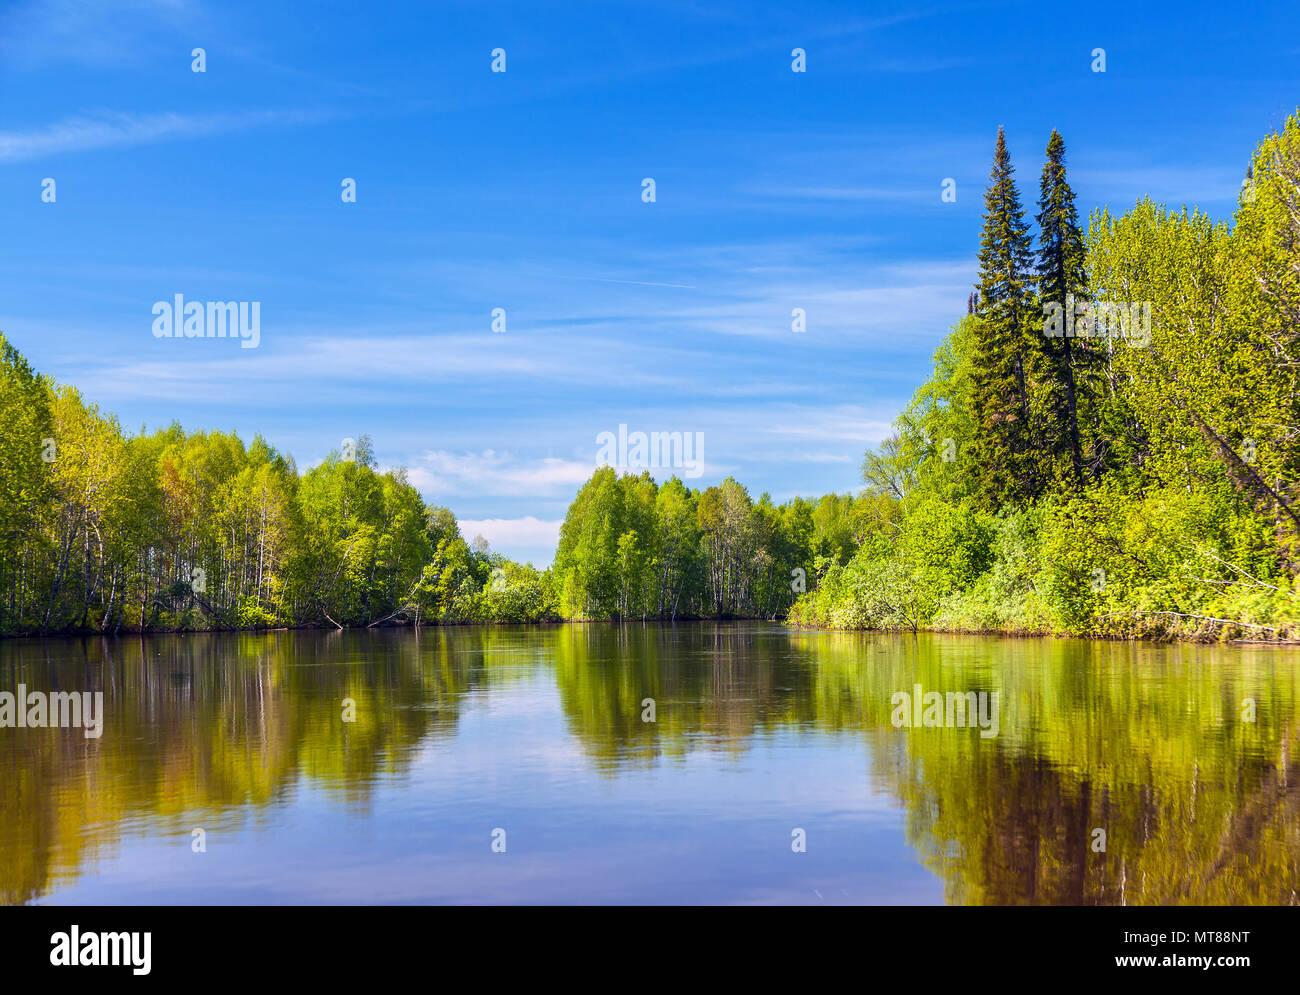 Summer in Siberia. - Stock Image